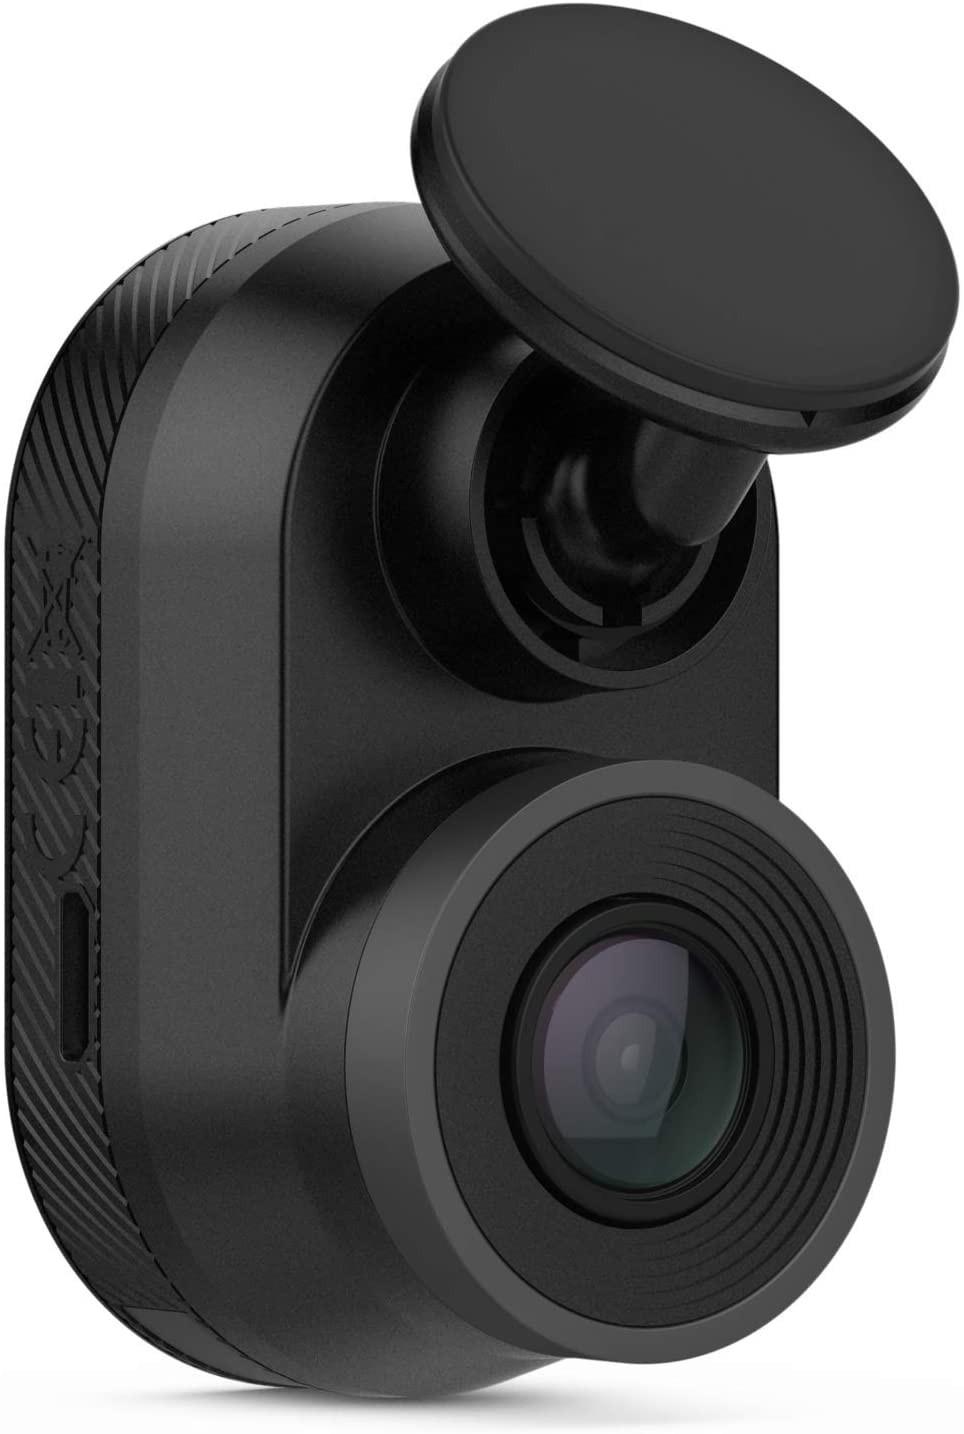 dashcam - Garmin Dash Cam Mini